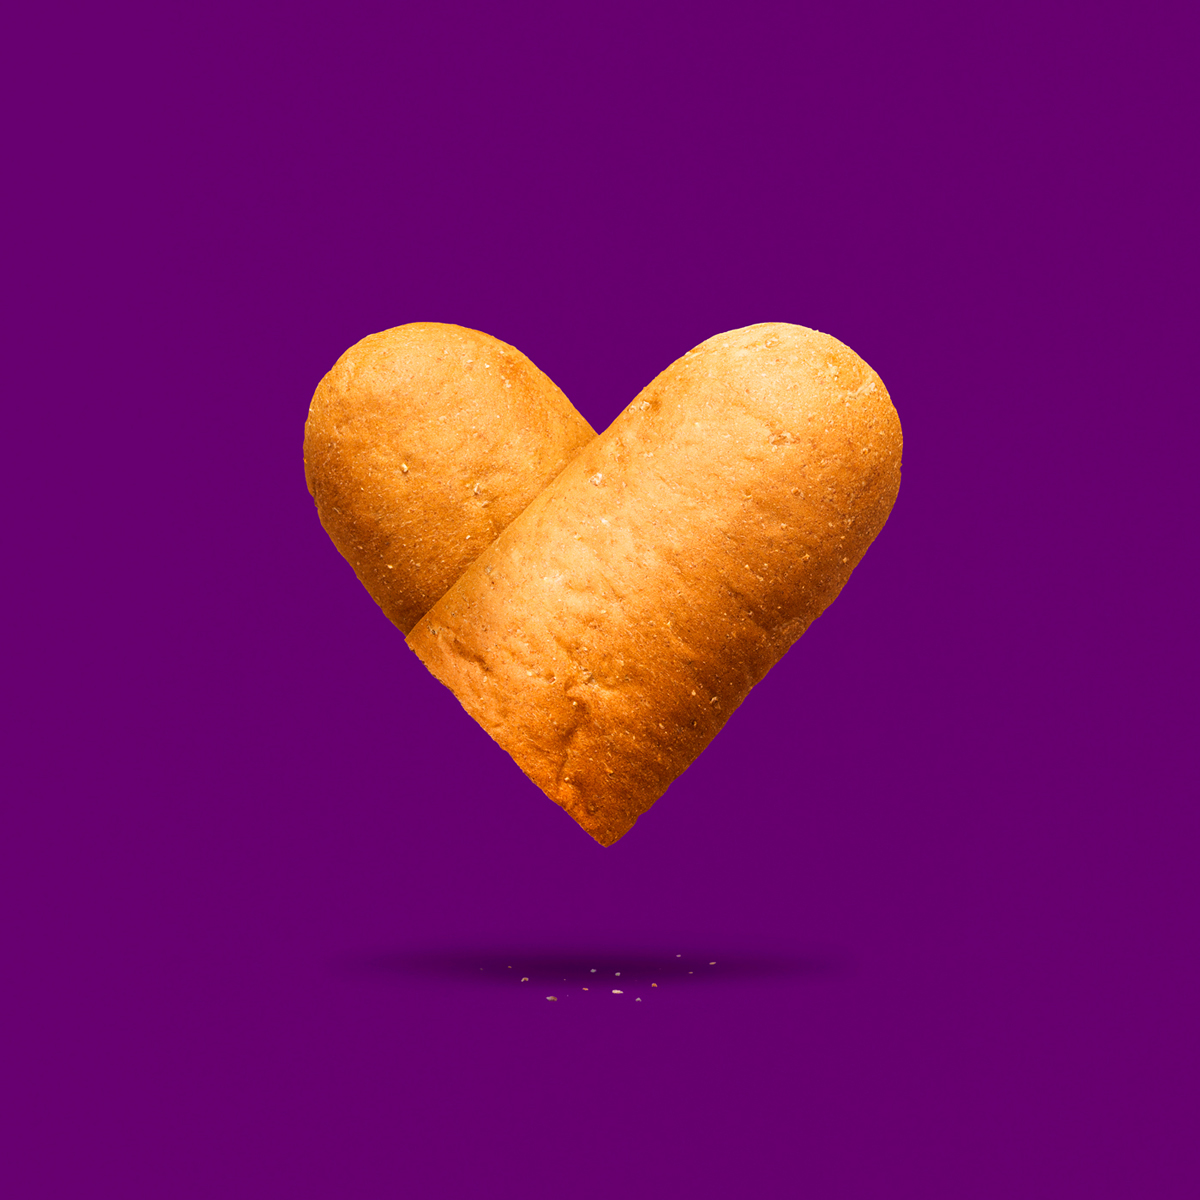 corazon pan